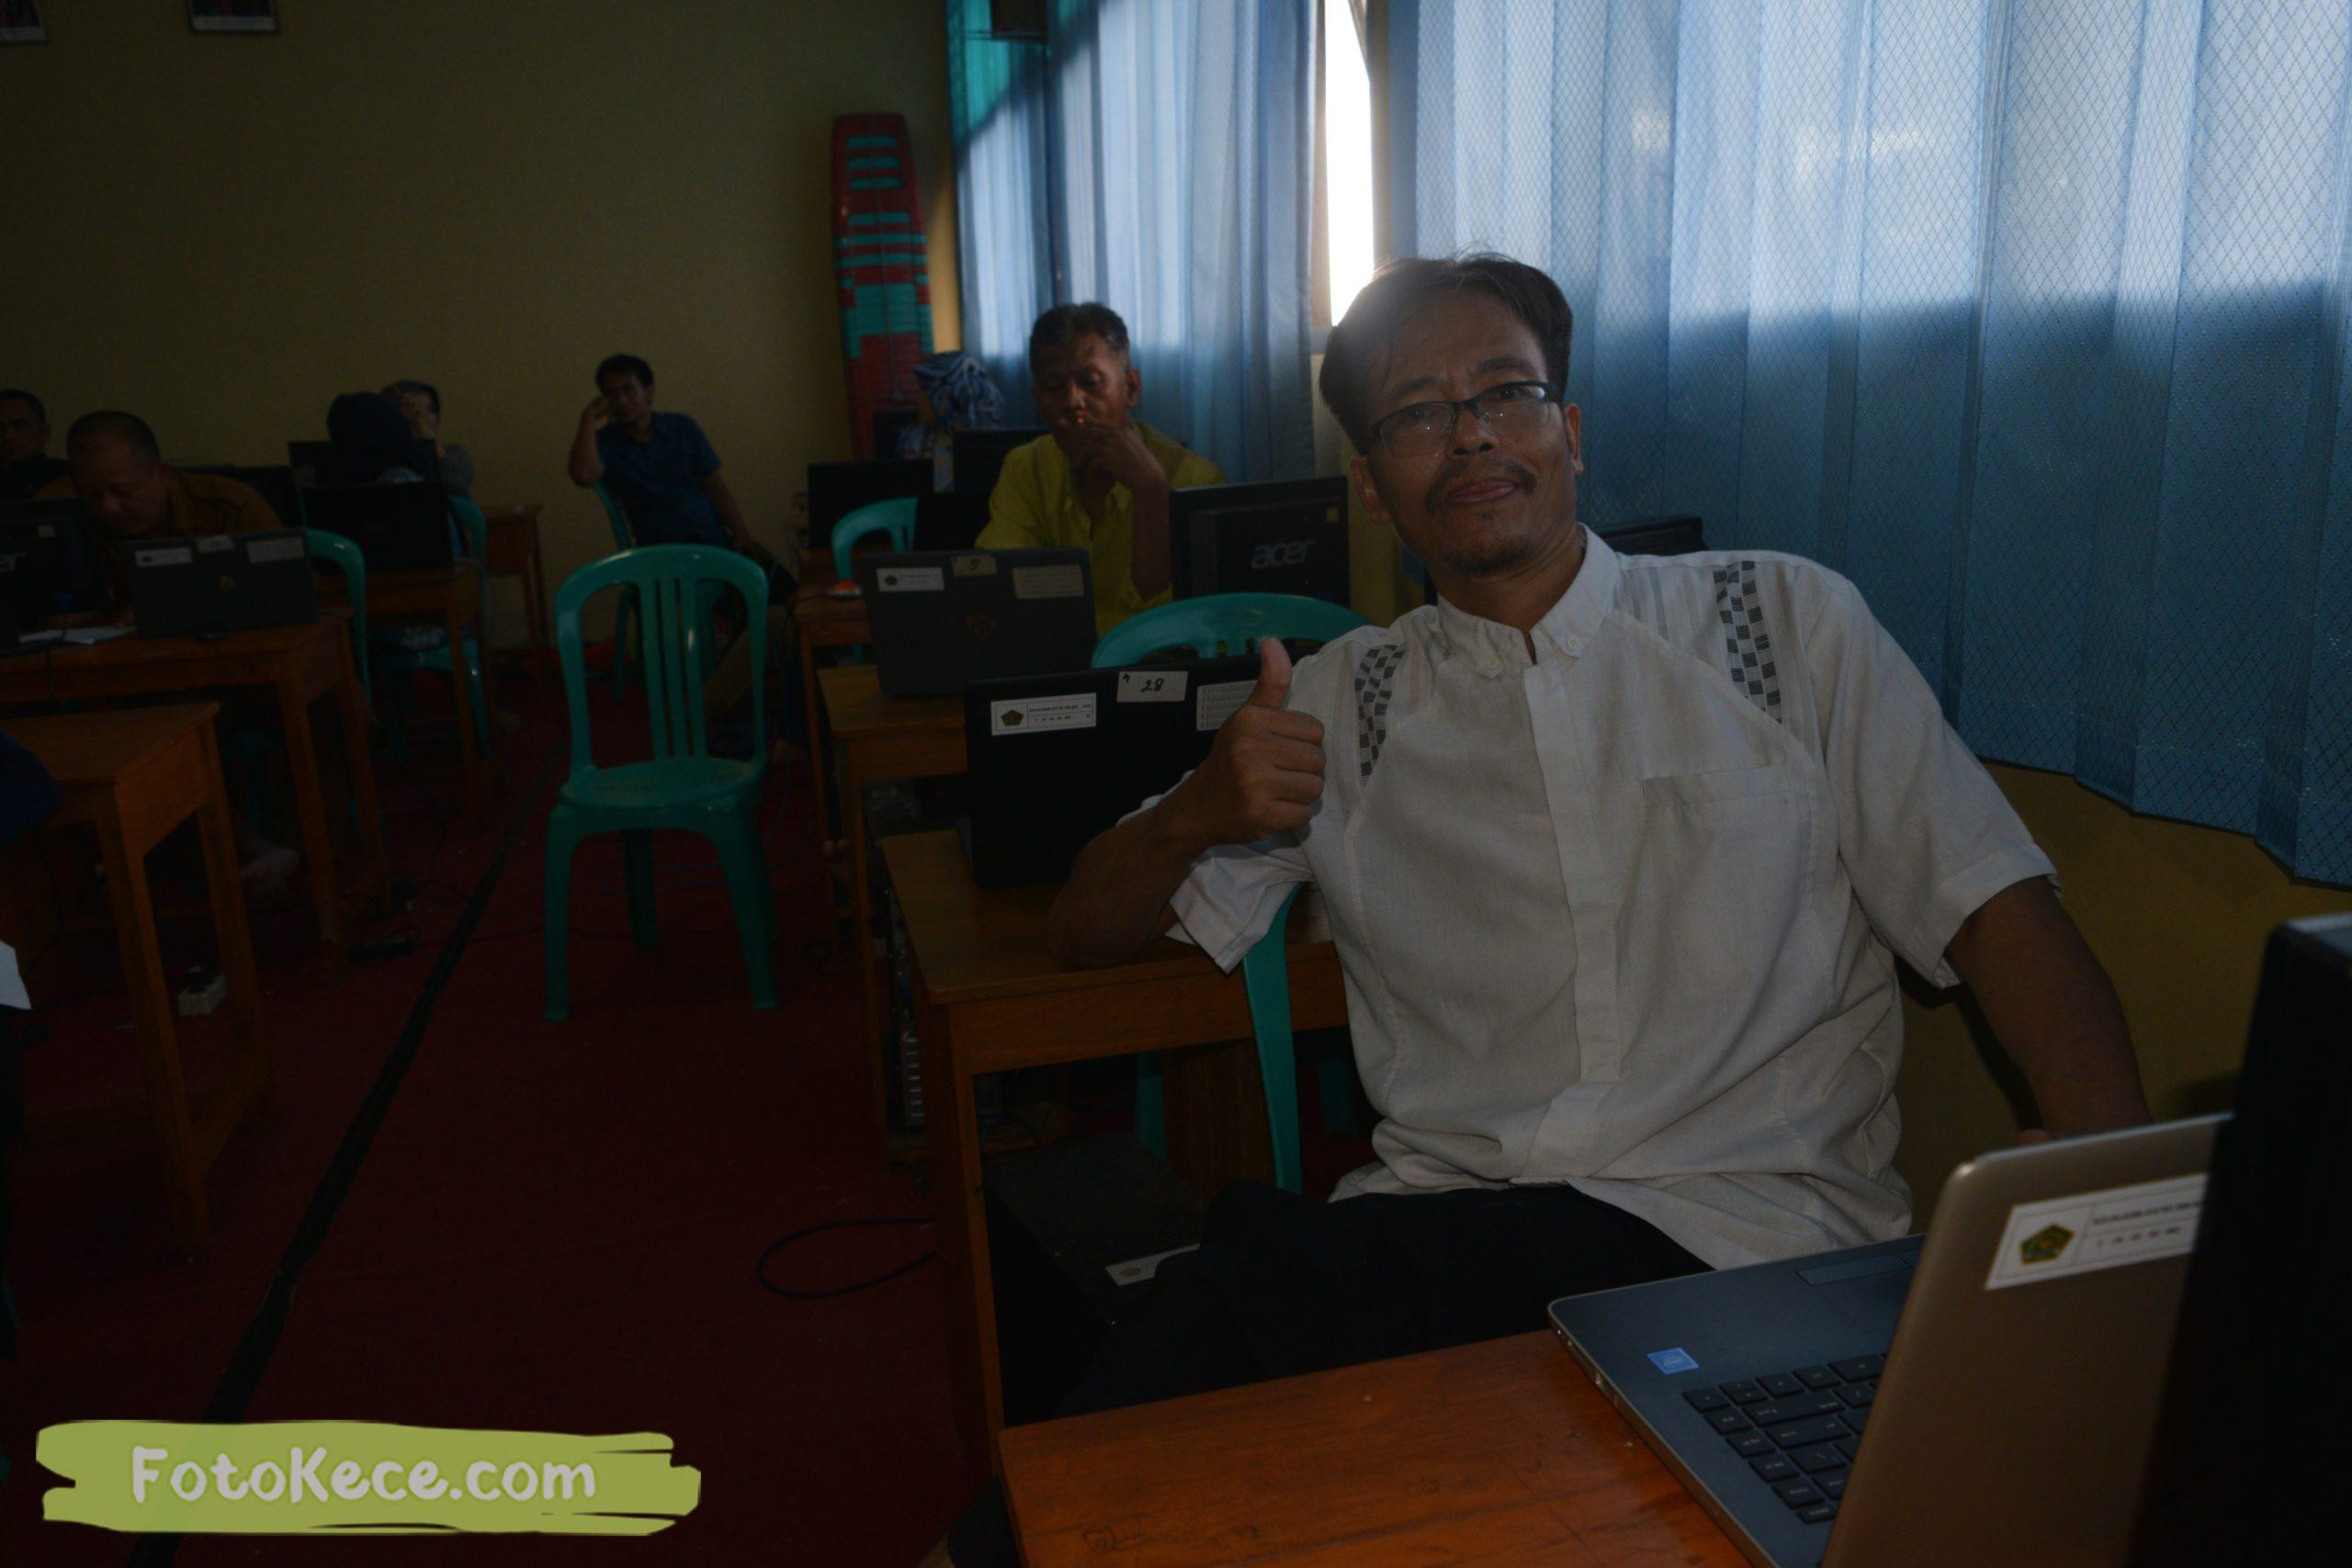 bimbingan teknis sieka 2020 bersama Bpk Abdul Aziz 08012020 fotokece 35 scaled